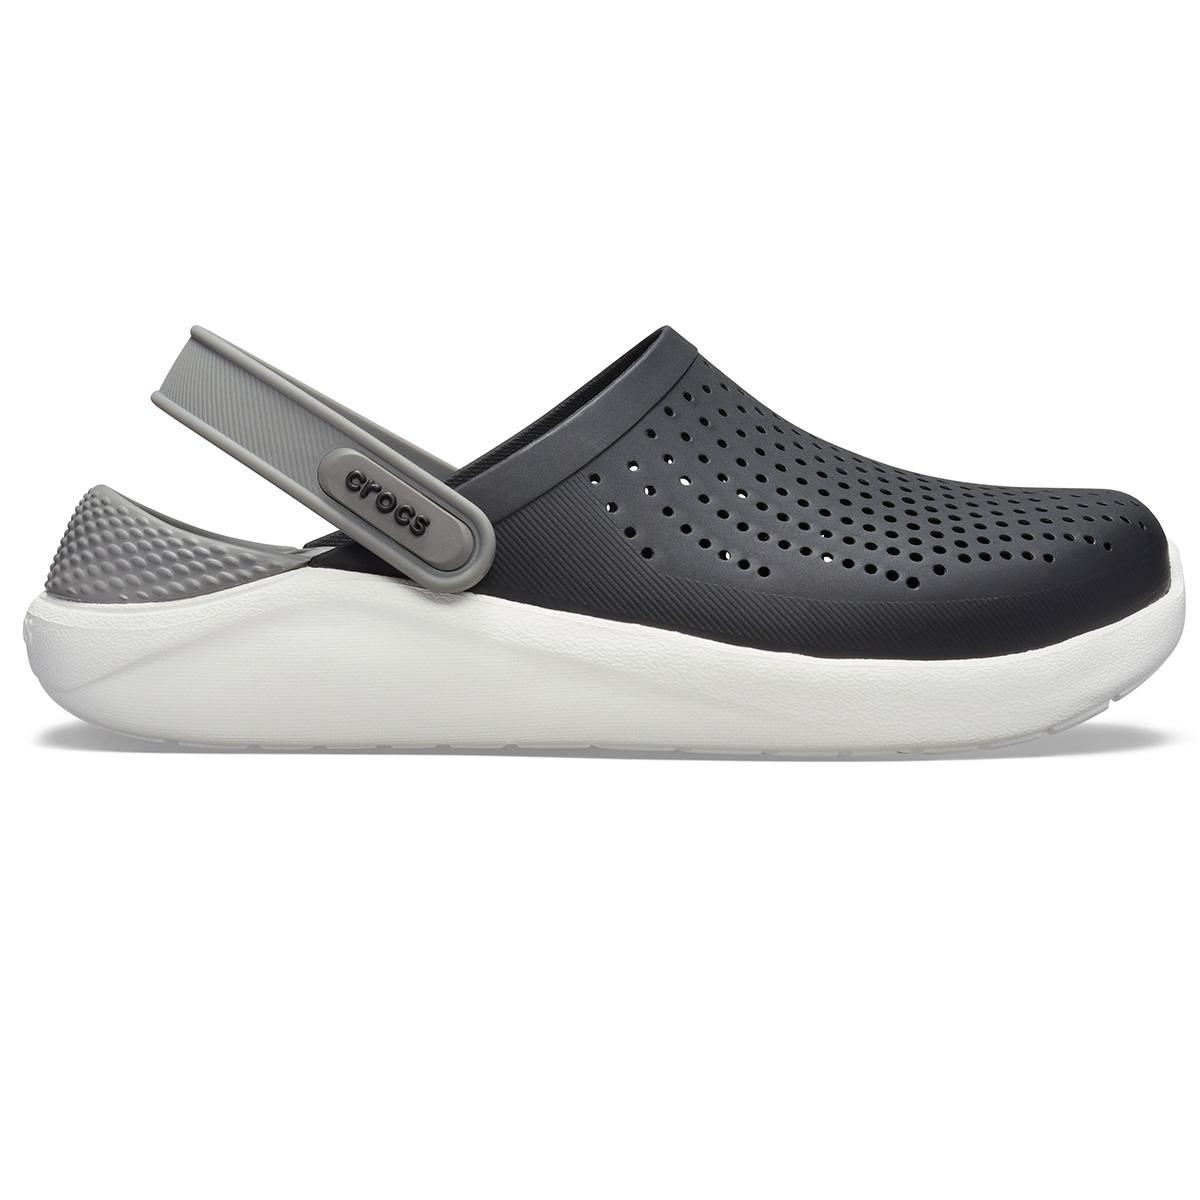 Crocs LiteRide Clog - Siyah/Duman